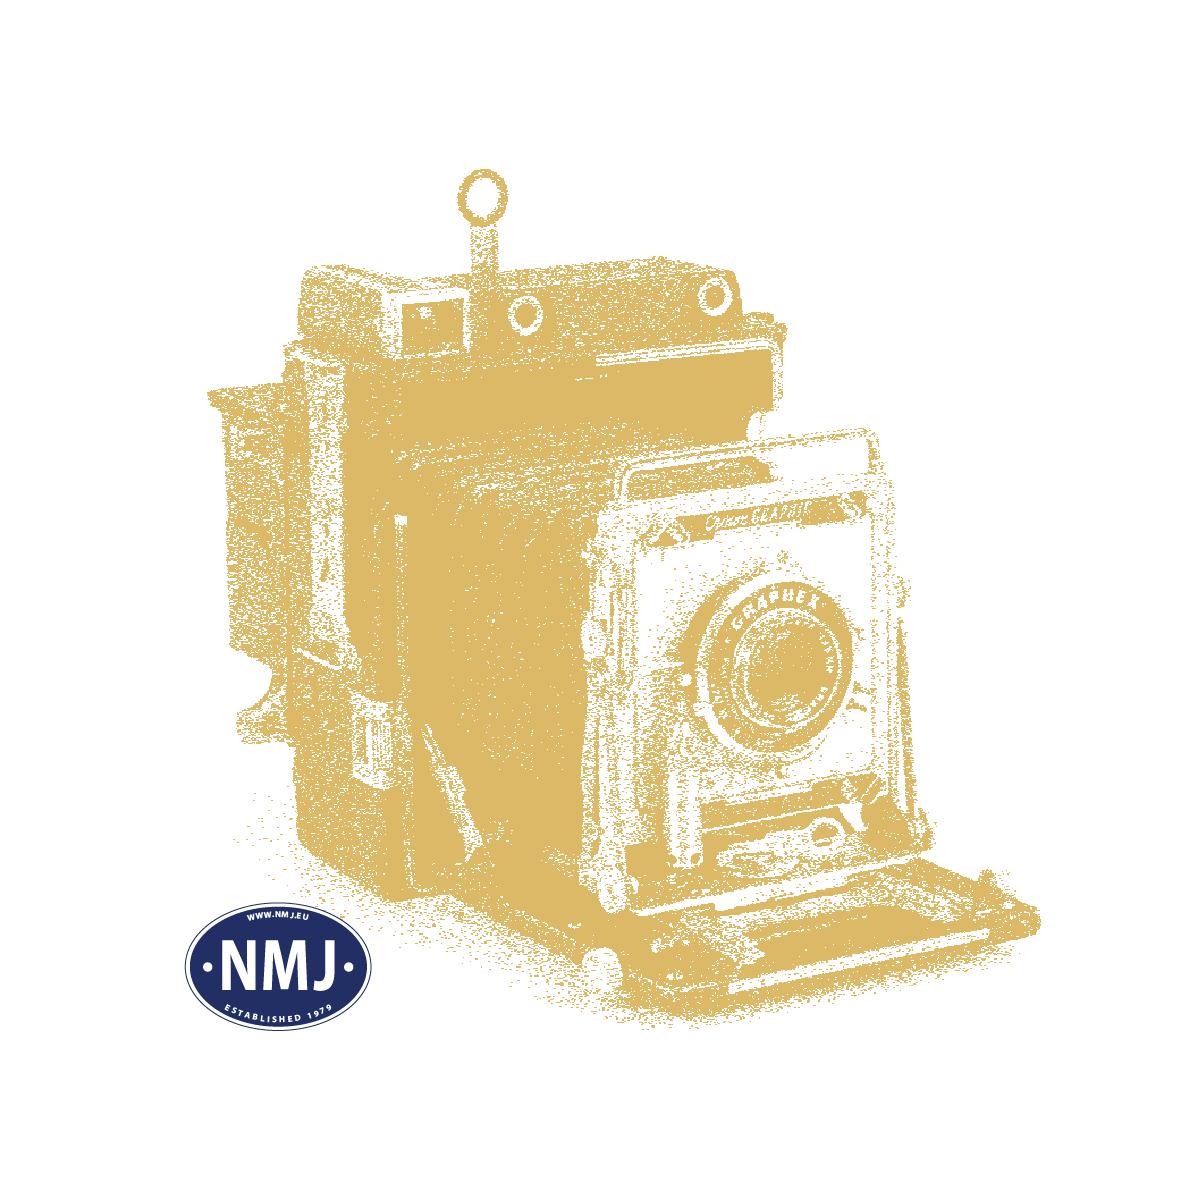 NMJSE1042 - NMJ Superline SJ E 1042